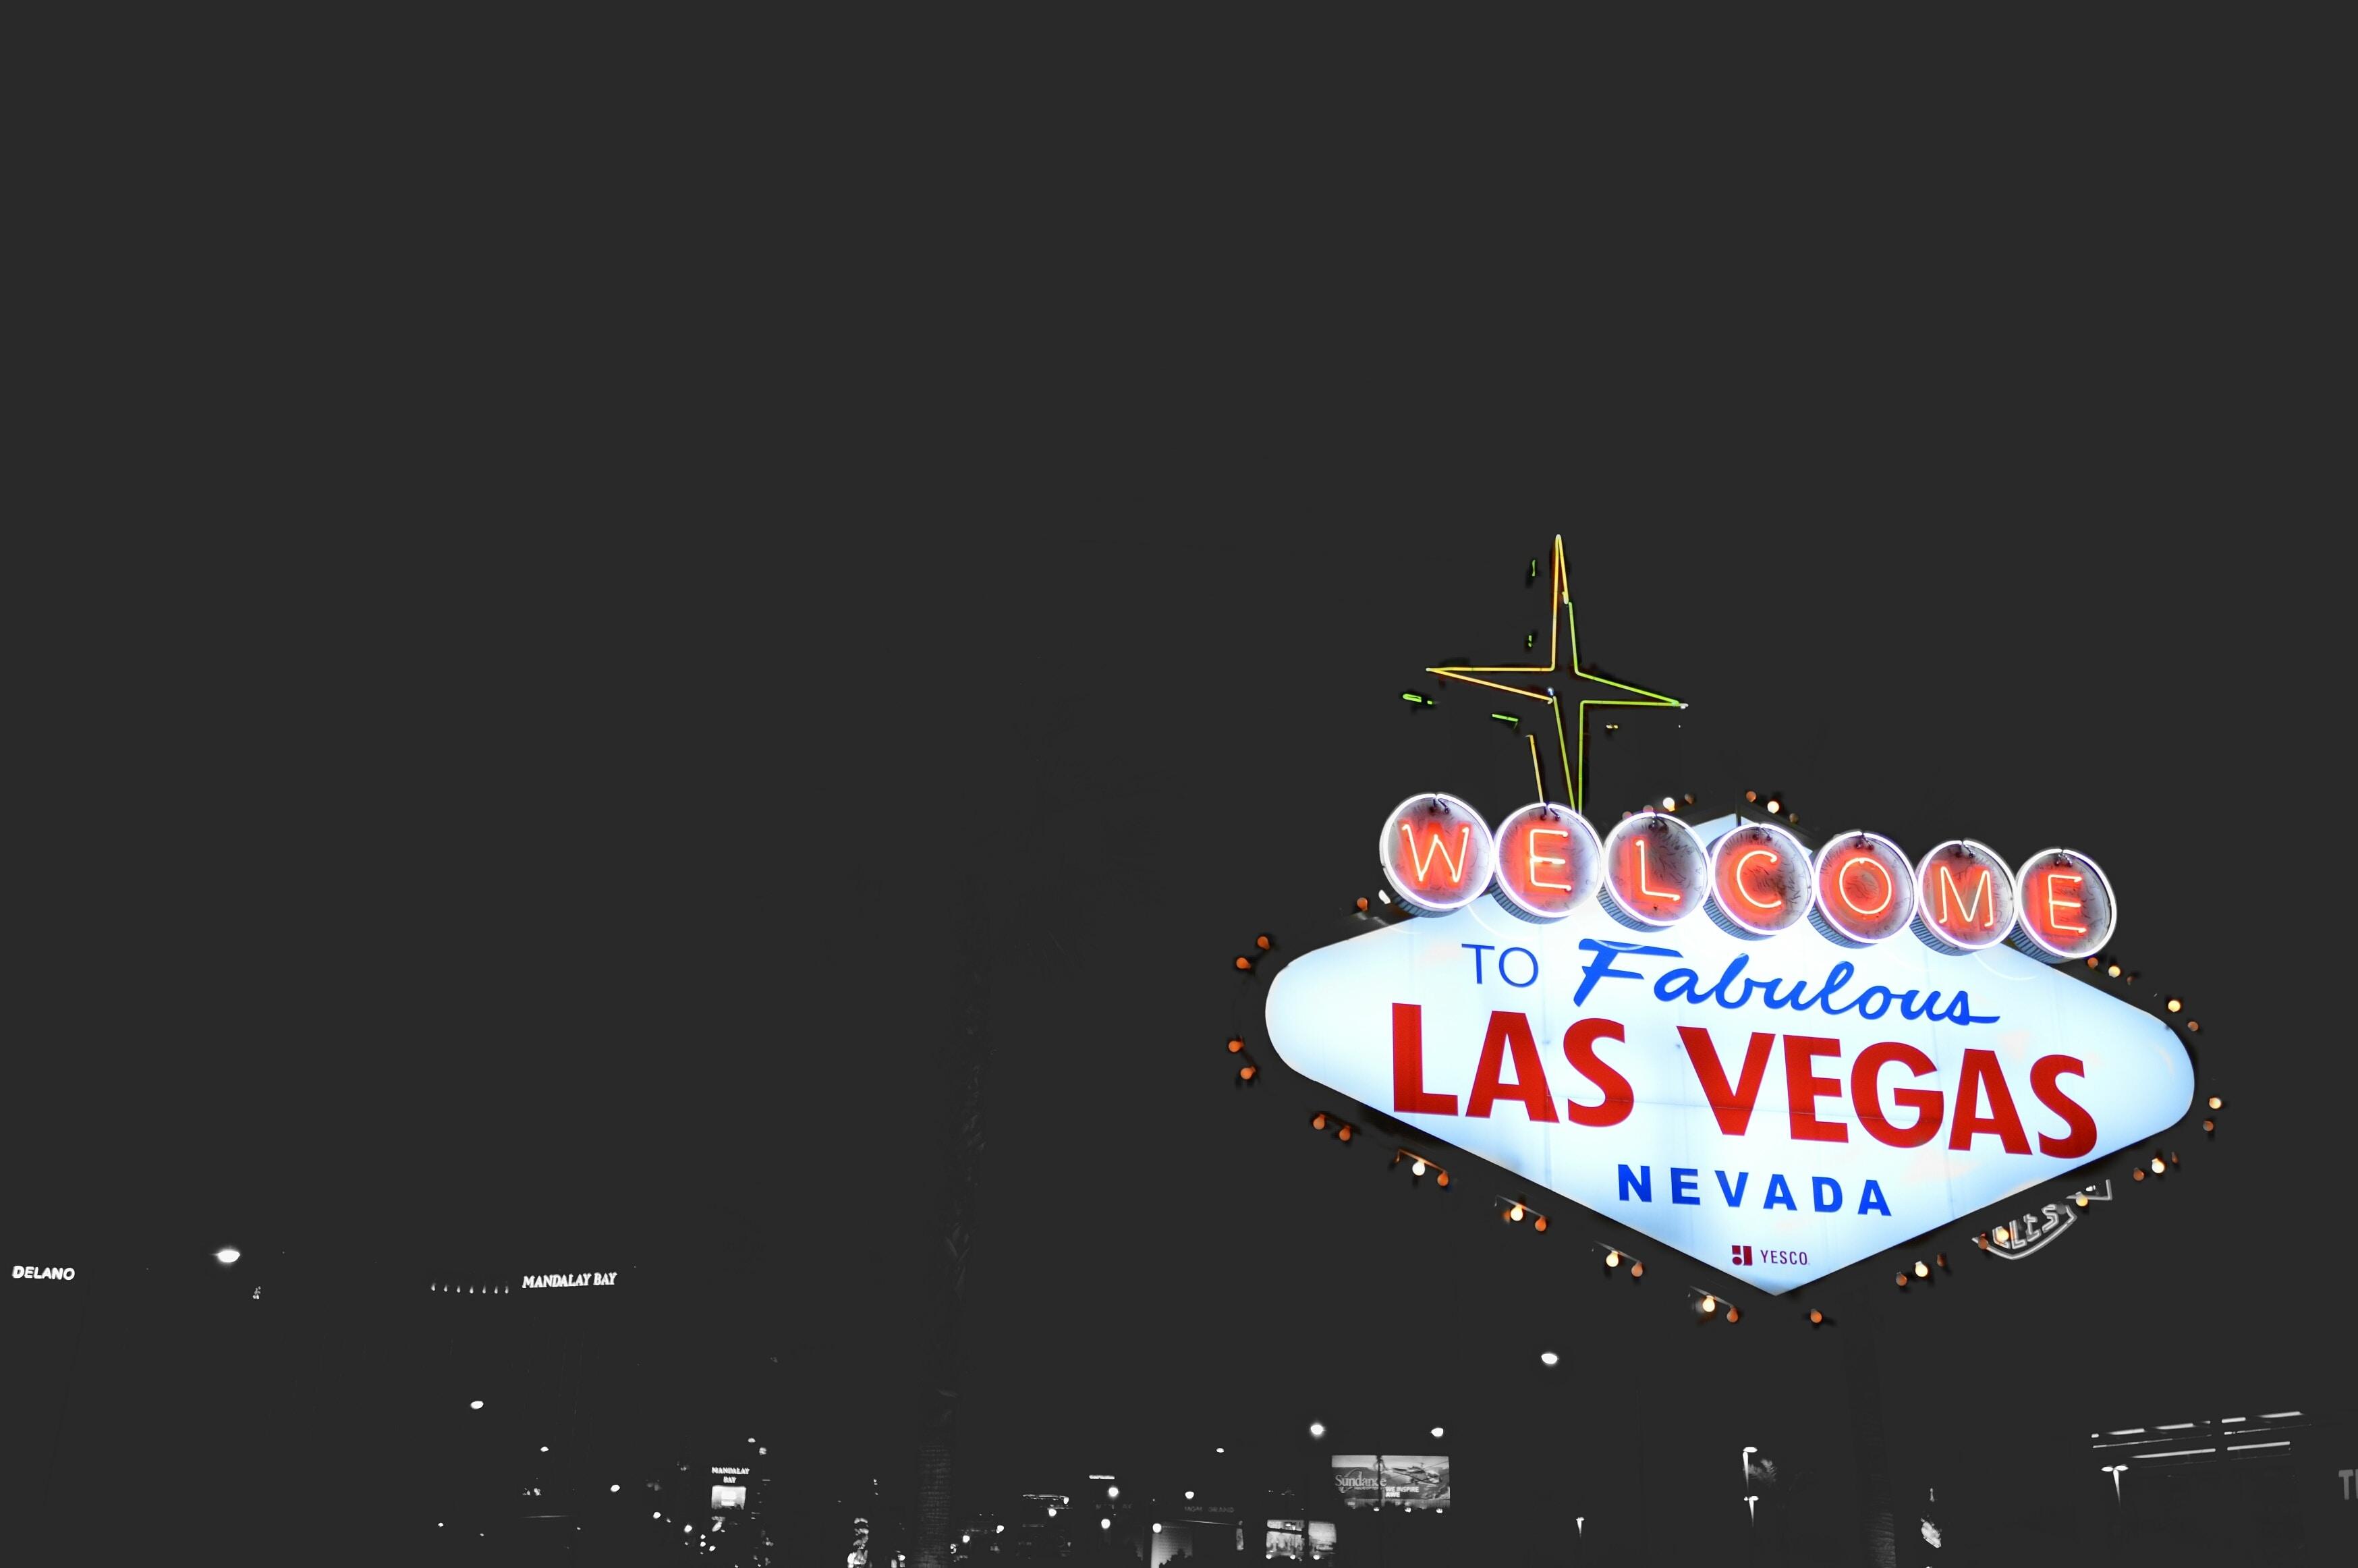 Las Vegas Nevada signage in Las Vegas, U.S.A. during nighttime